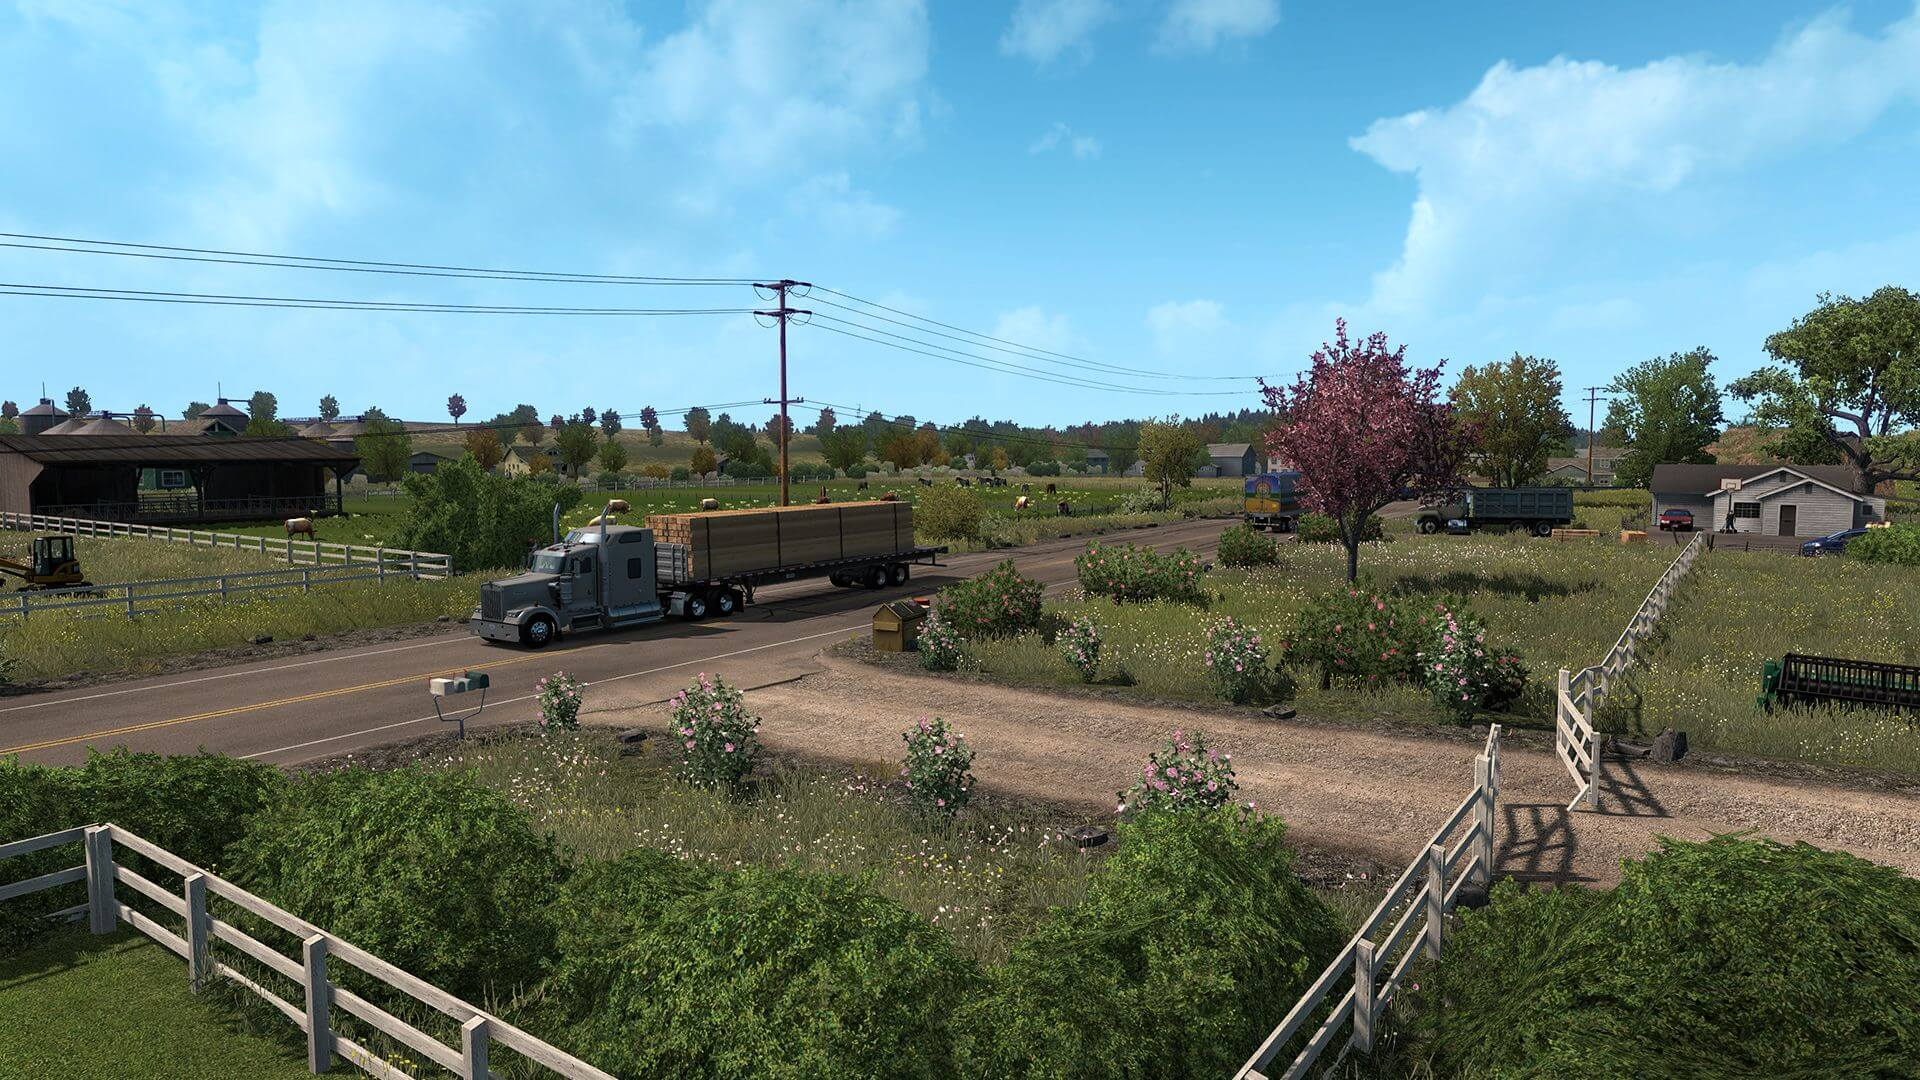 В Steam появились страницы дополнений Euro Truck Simulator 2 - Beyond the Baltic Sea и American Truck Simulator - Oregon